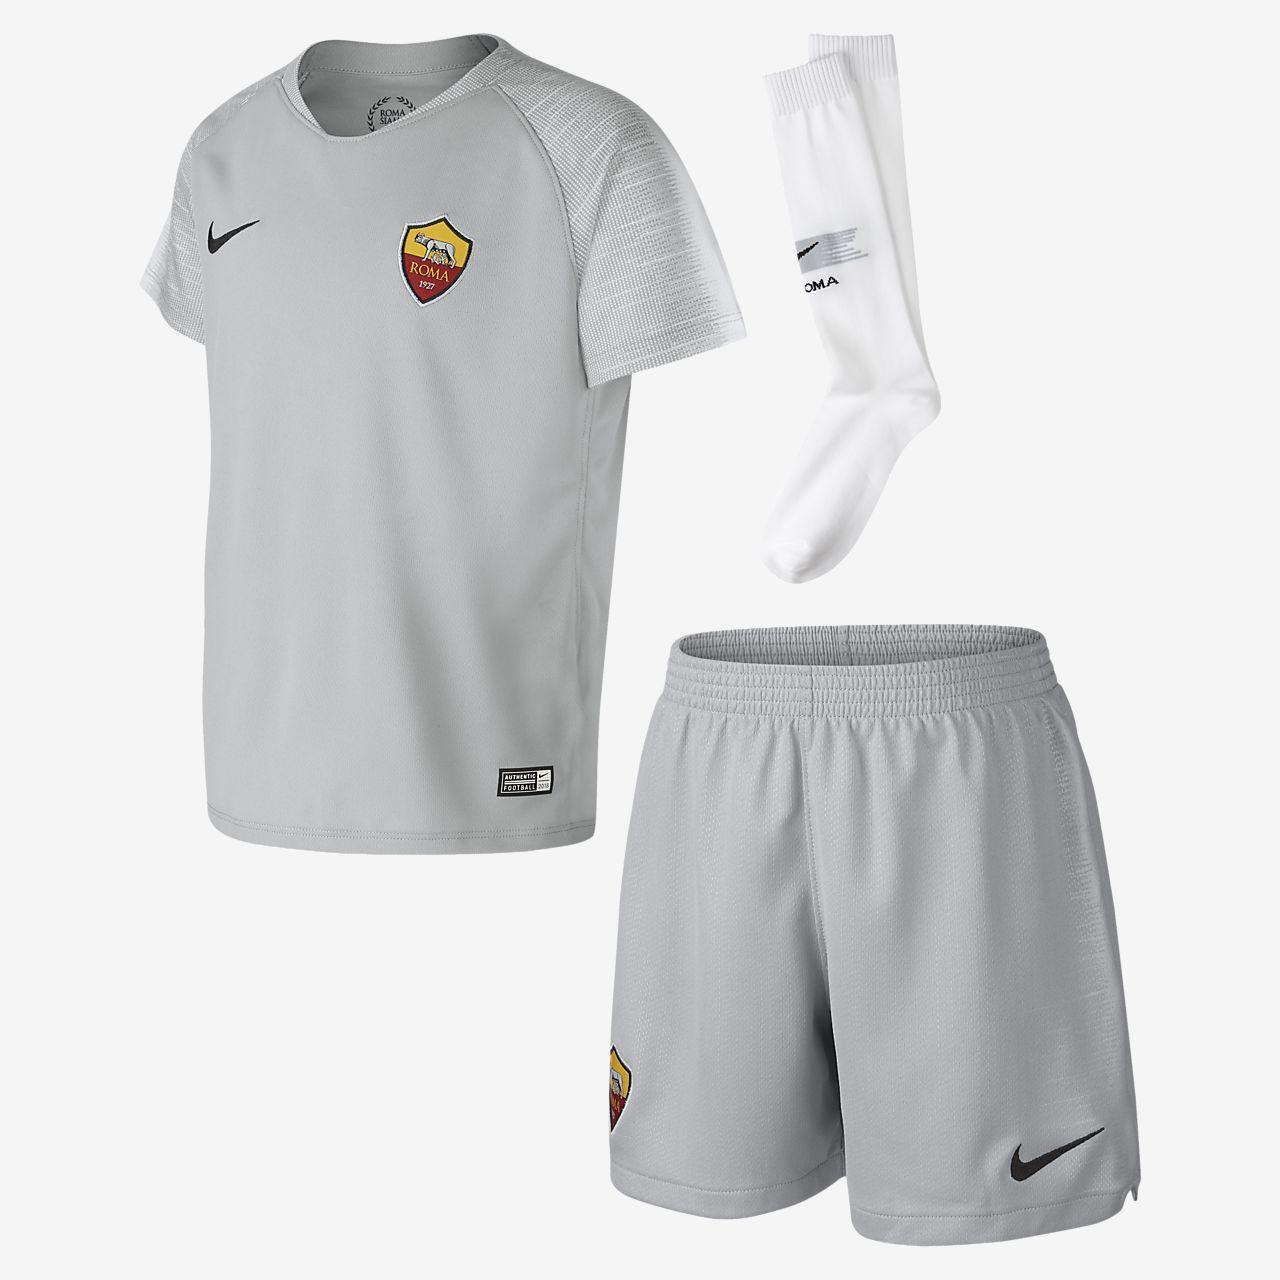 2018/19 A.S. Rom Stadium Away Fußballtrikot-Set für jüngere Kinder